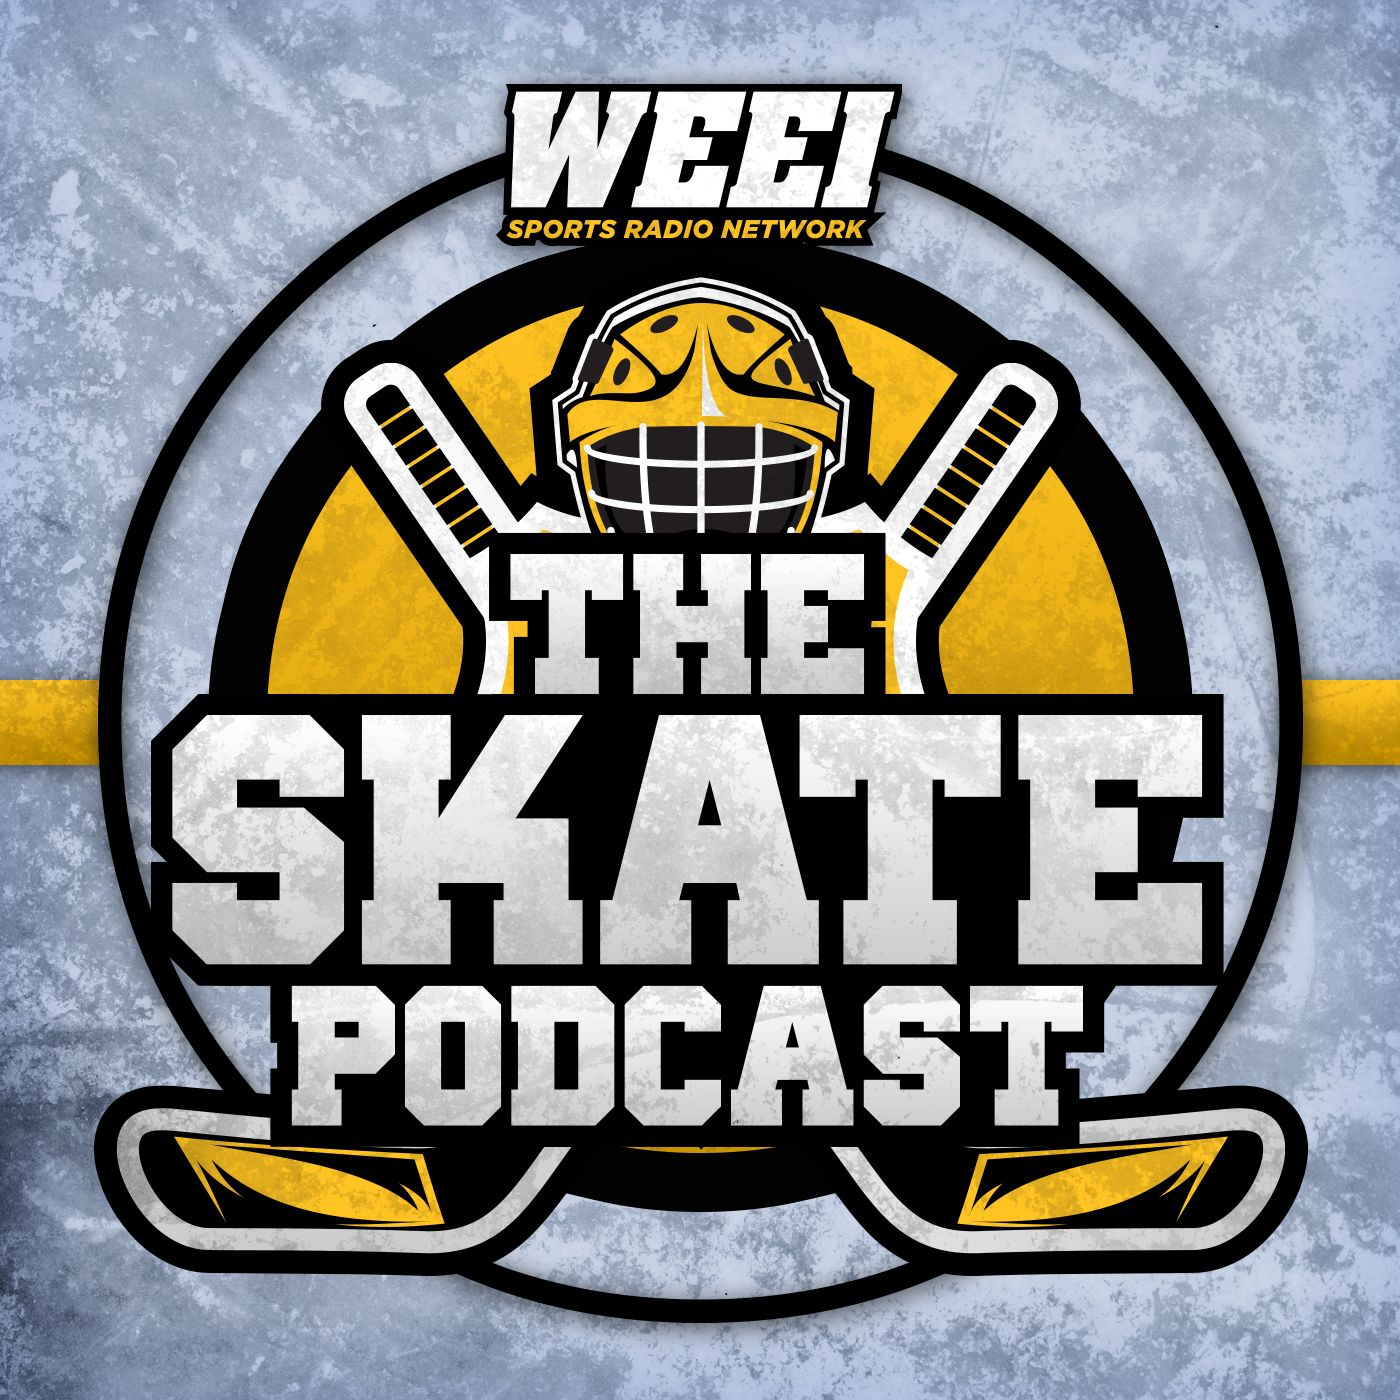 The Skate Podcast